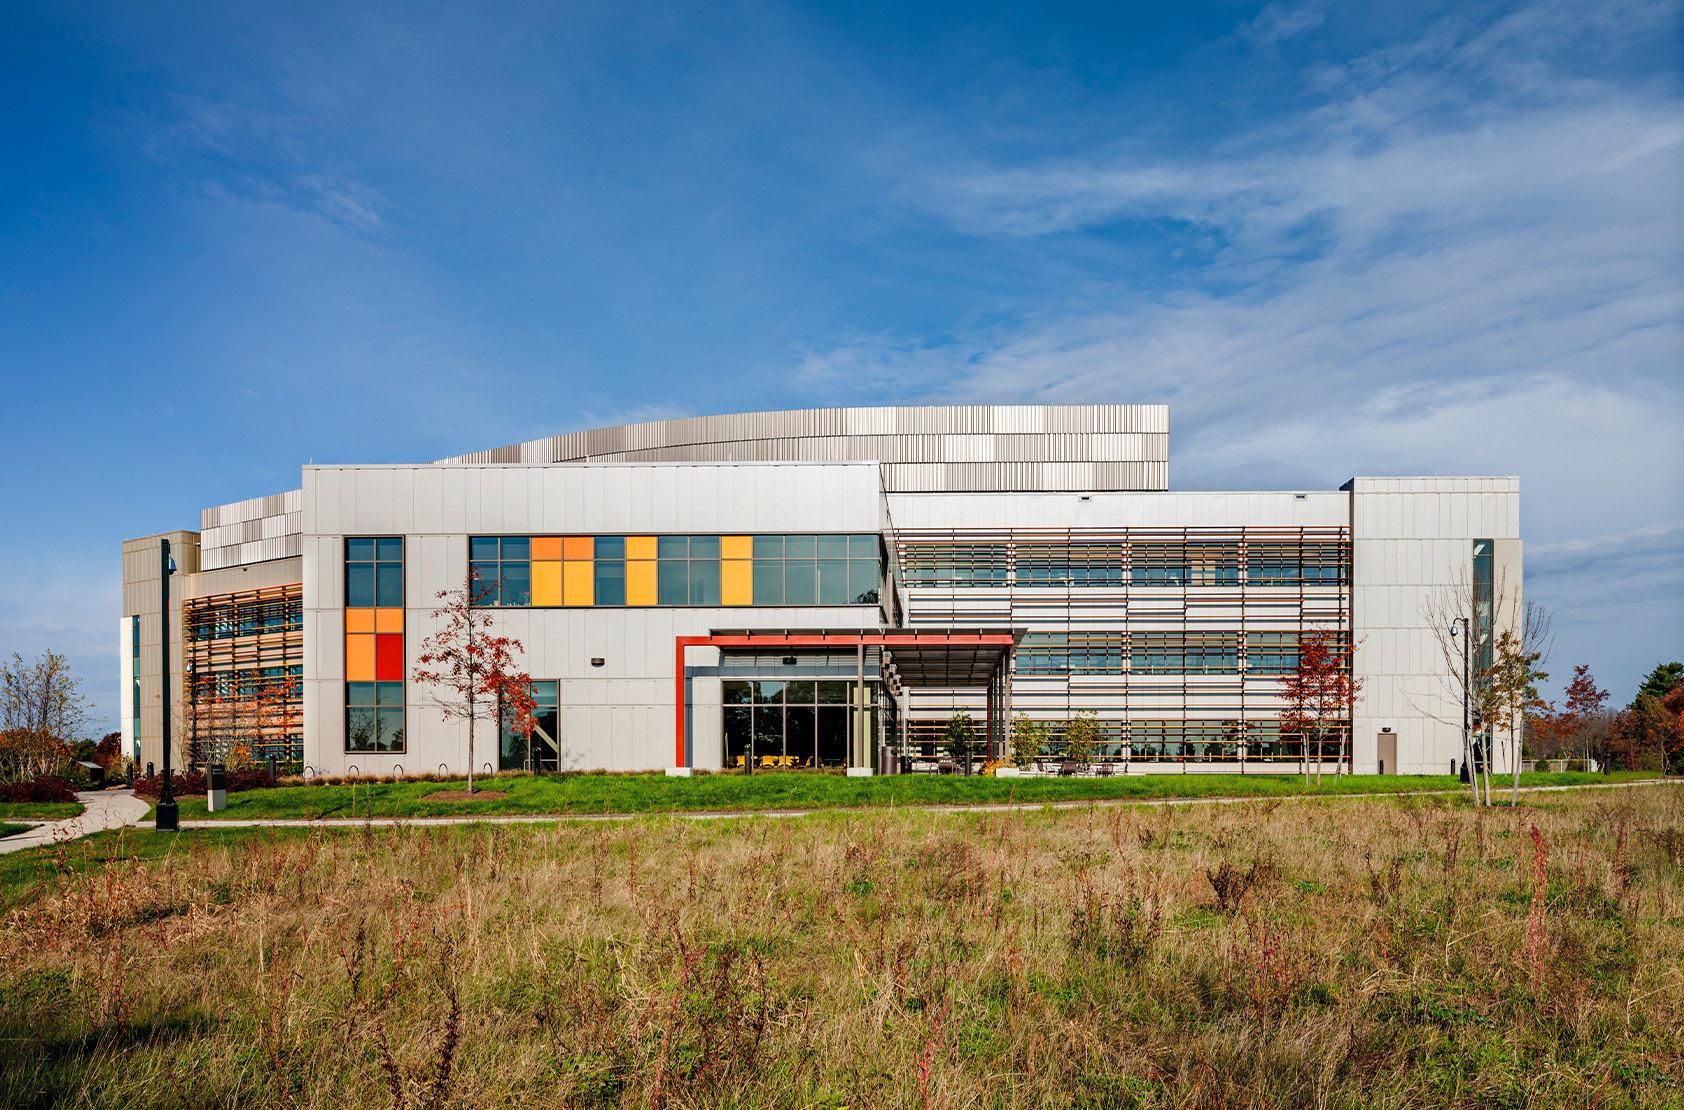 State of Connecticut - Public Health Laboratory